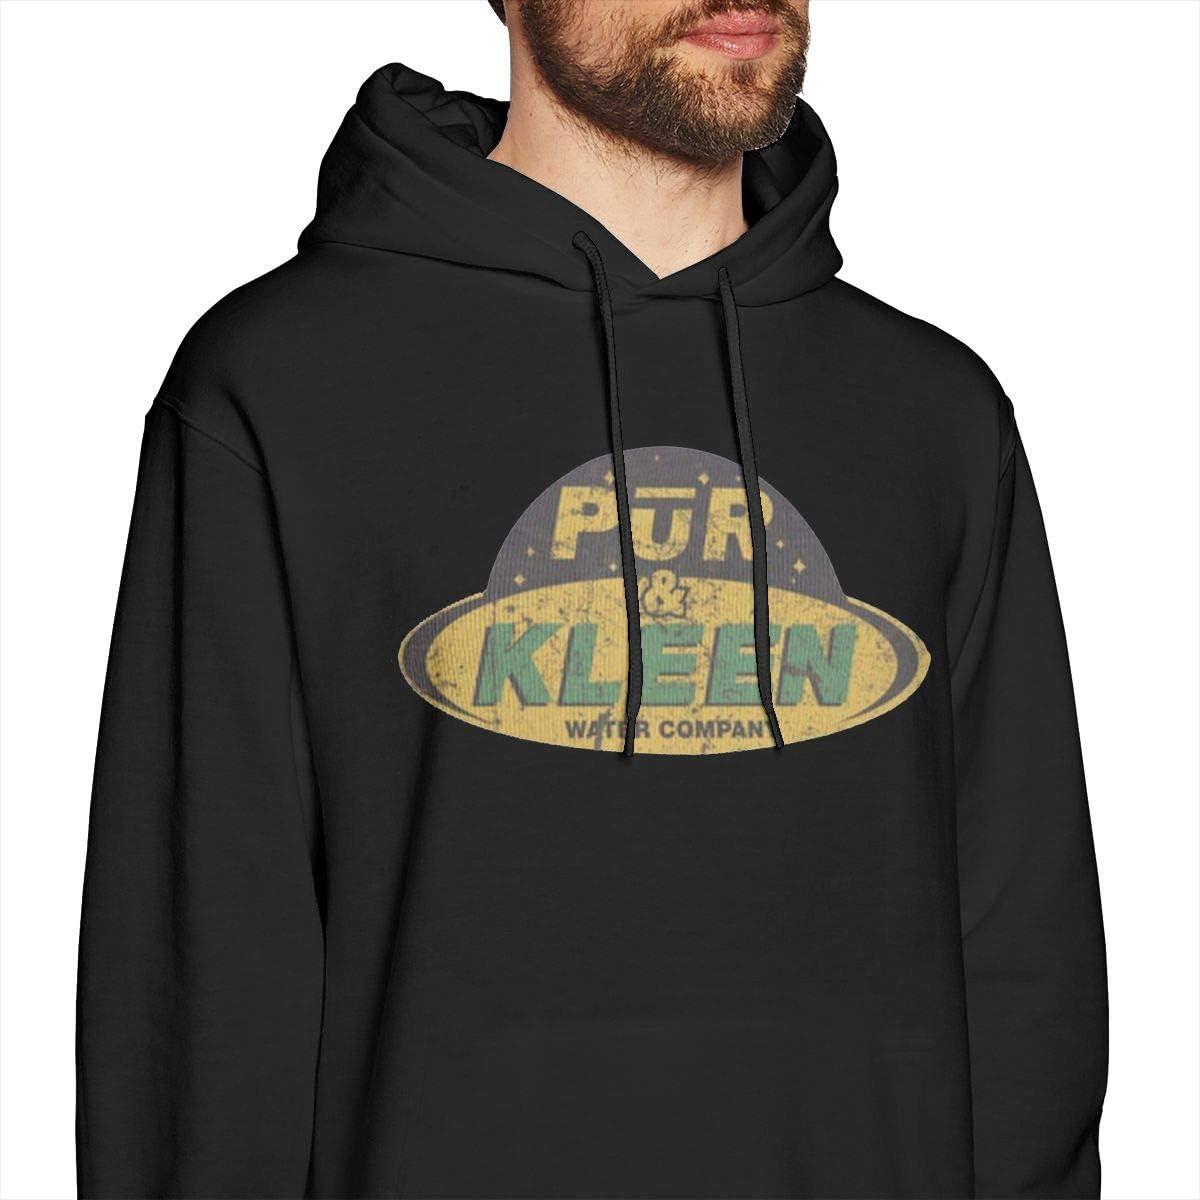 Mens Hooded Sweatshirt Pur N Kleen Original Retro Literary Design Black